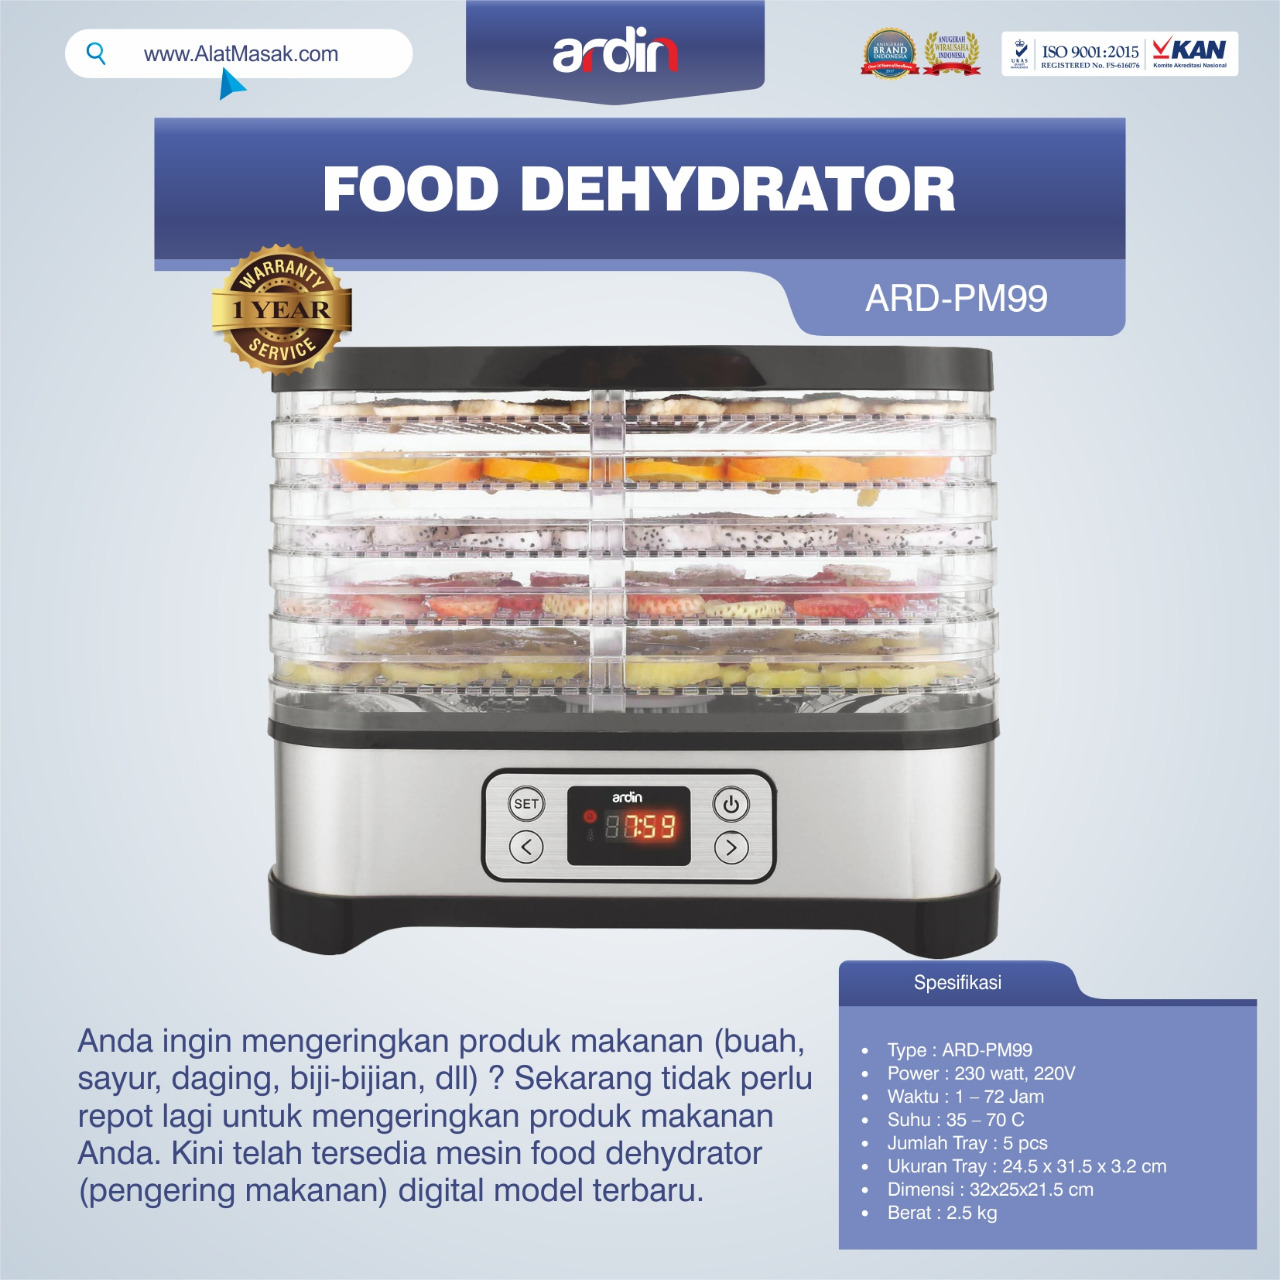 Jual Food Dehydrator ARD-PM99 di Pekanbaru